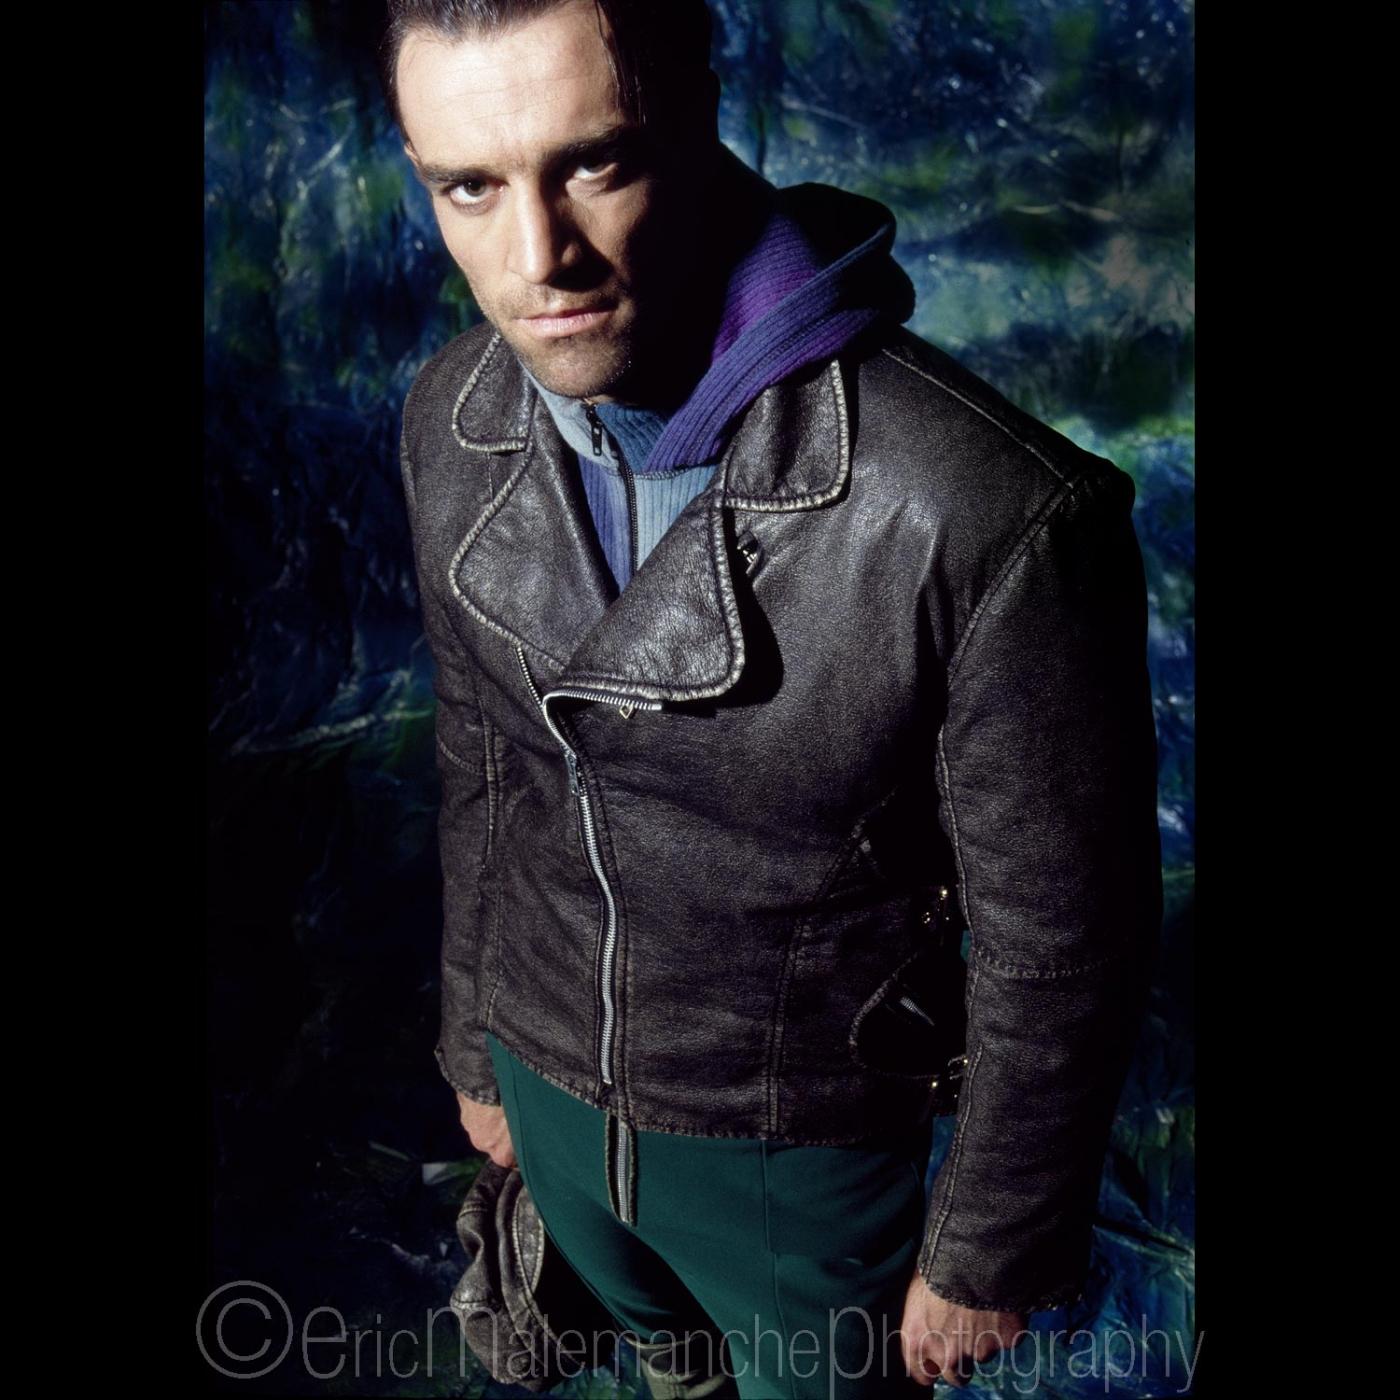 http://www.ericmalemanche.com/imagess/topics/fashion-90-s/liste/Fashion-17.jpg